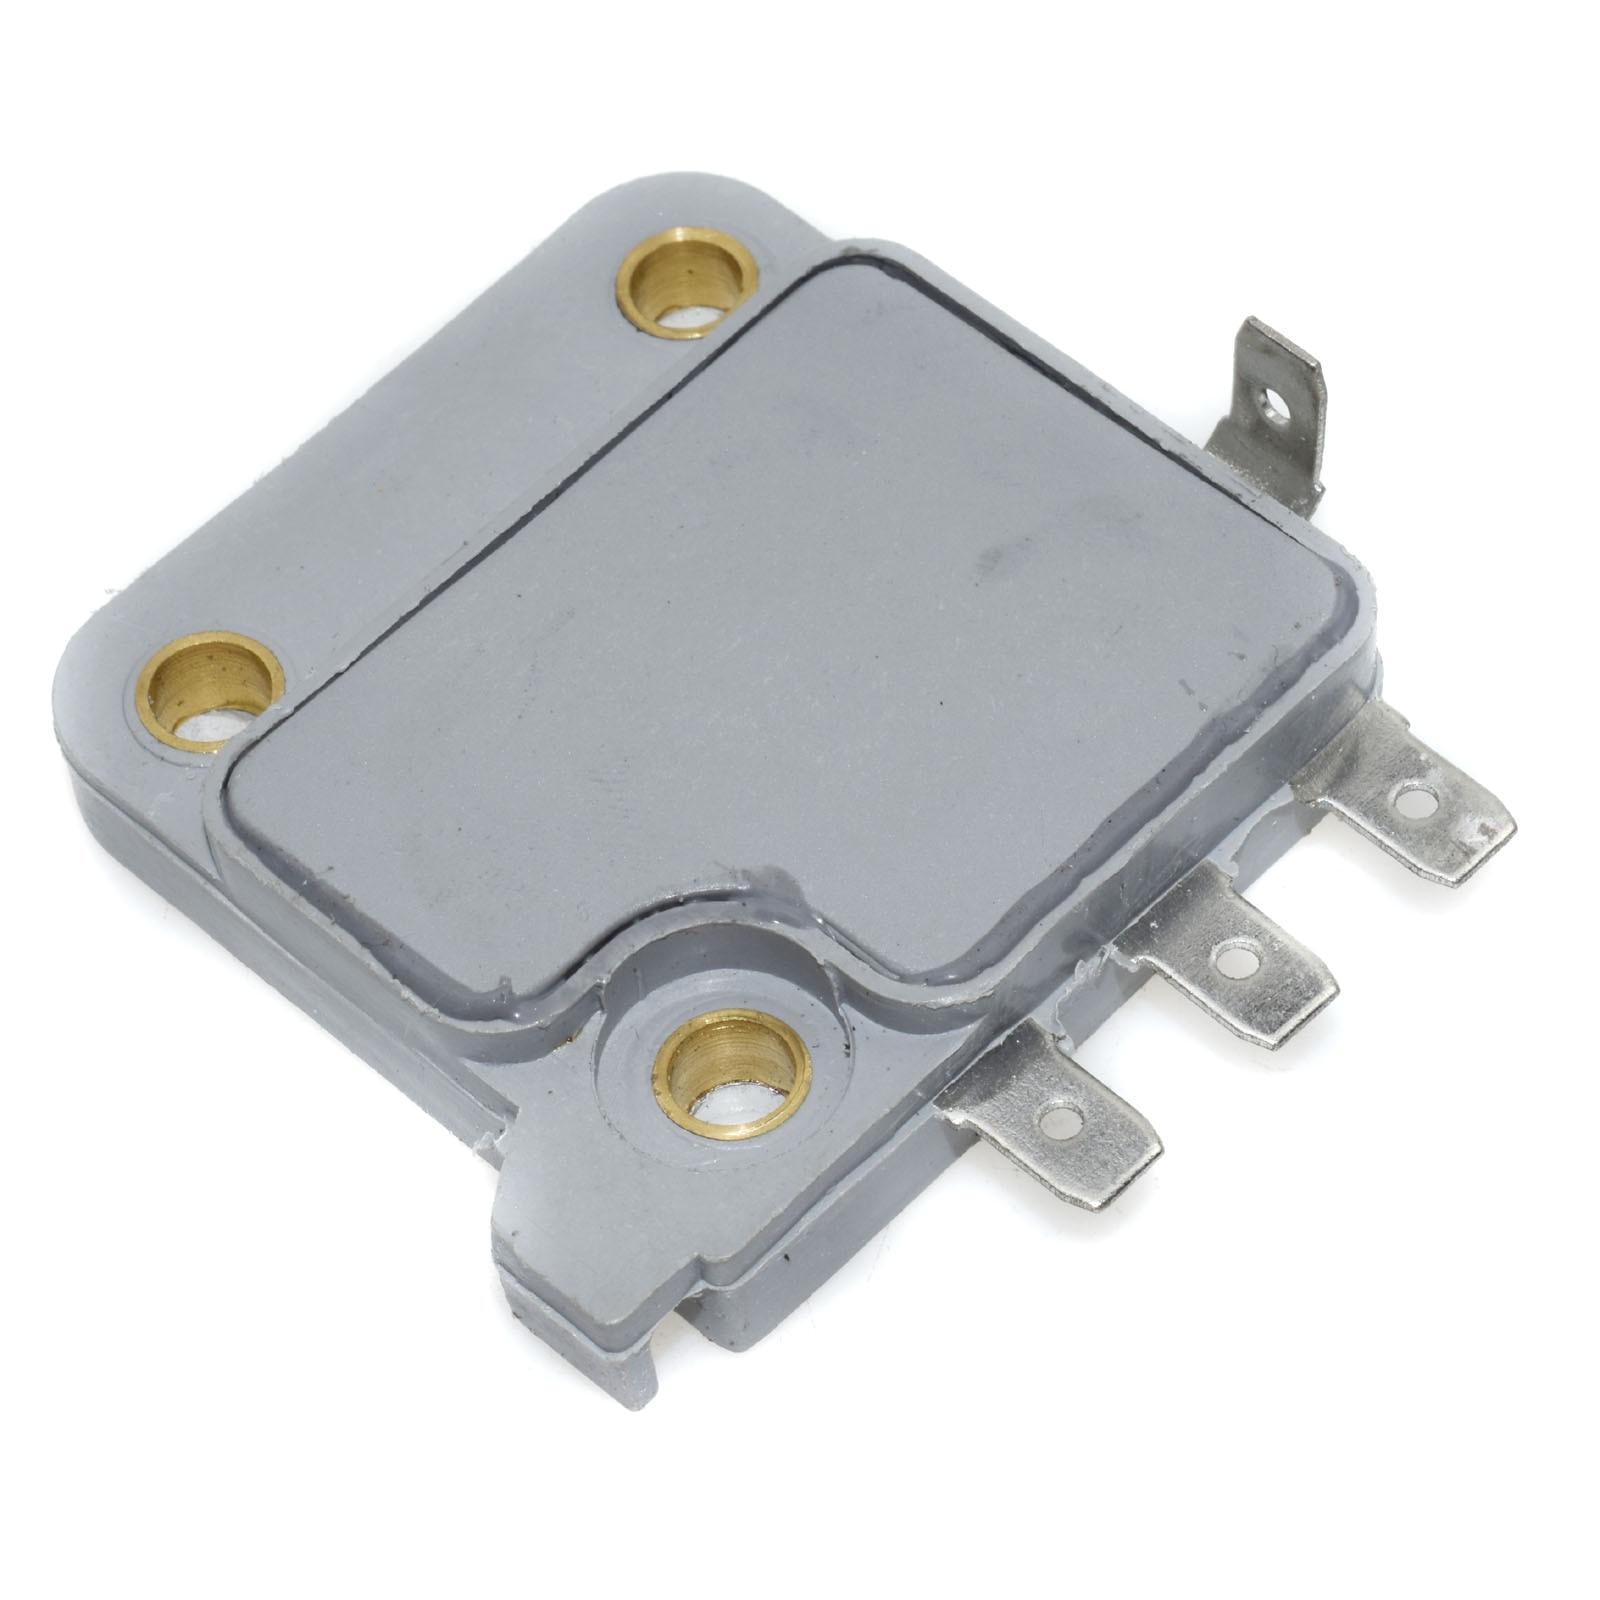 Map Sensor Pigtail Plug For Honda Civic 1992-2000 Accord 92-97 CR-V 1997-2000